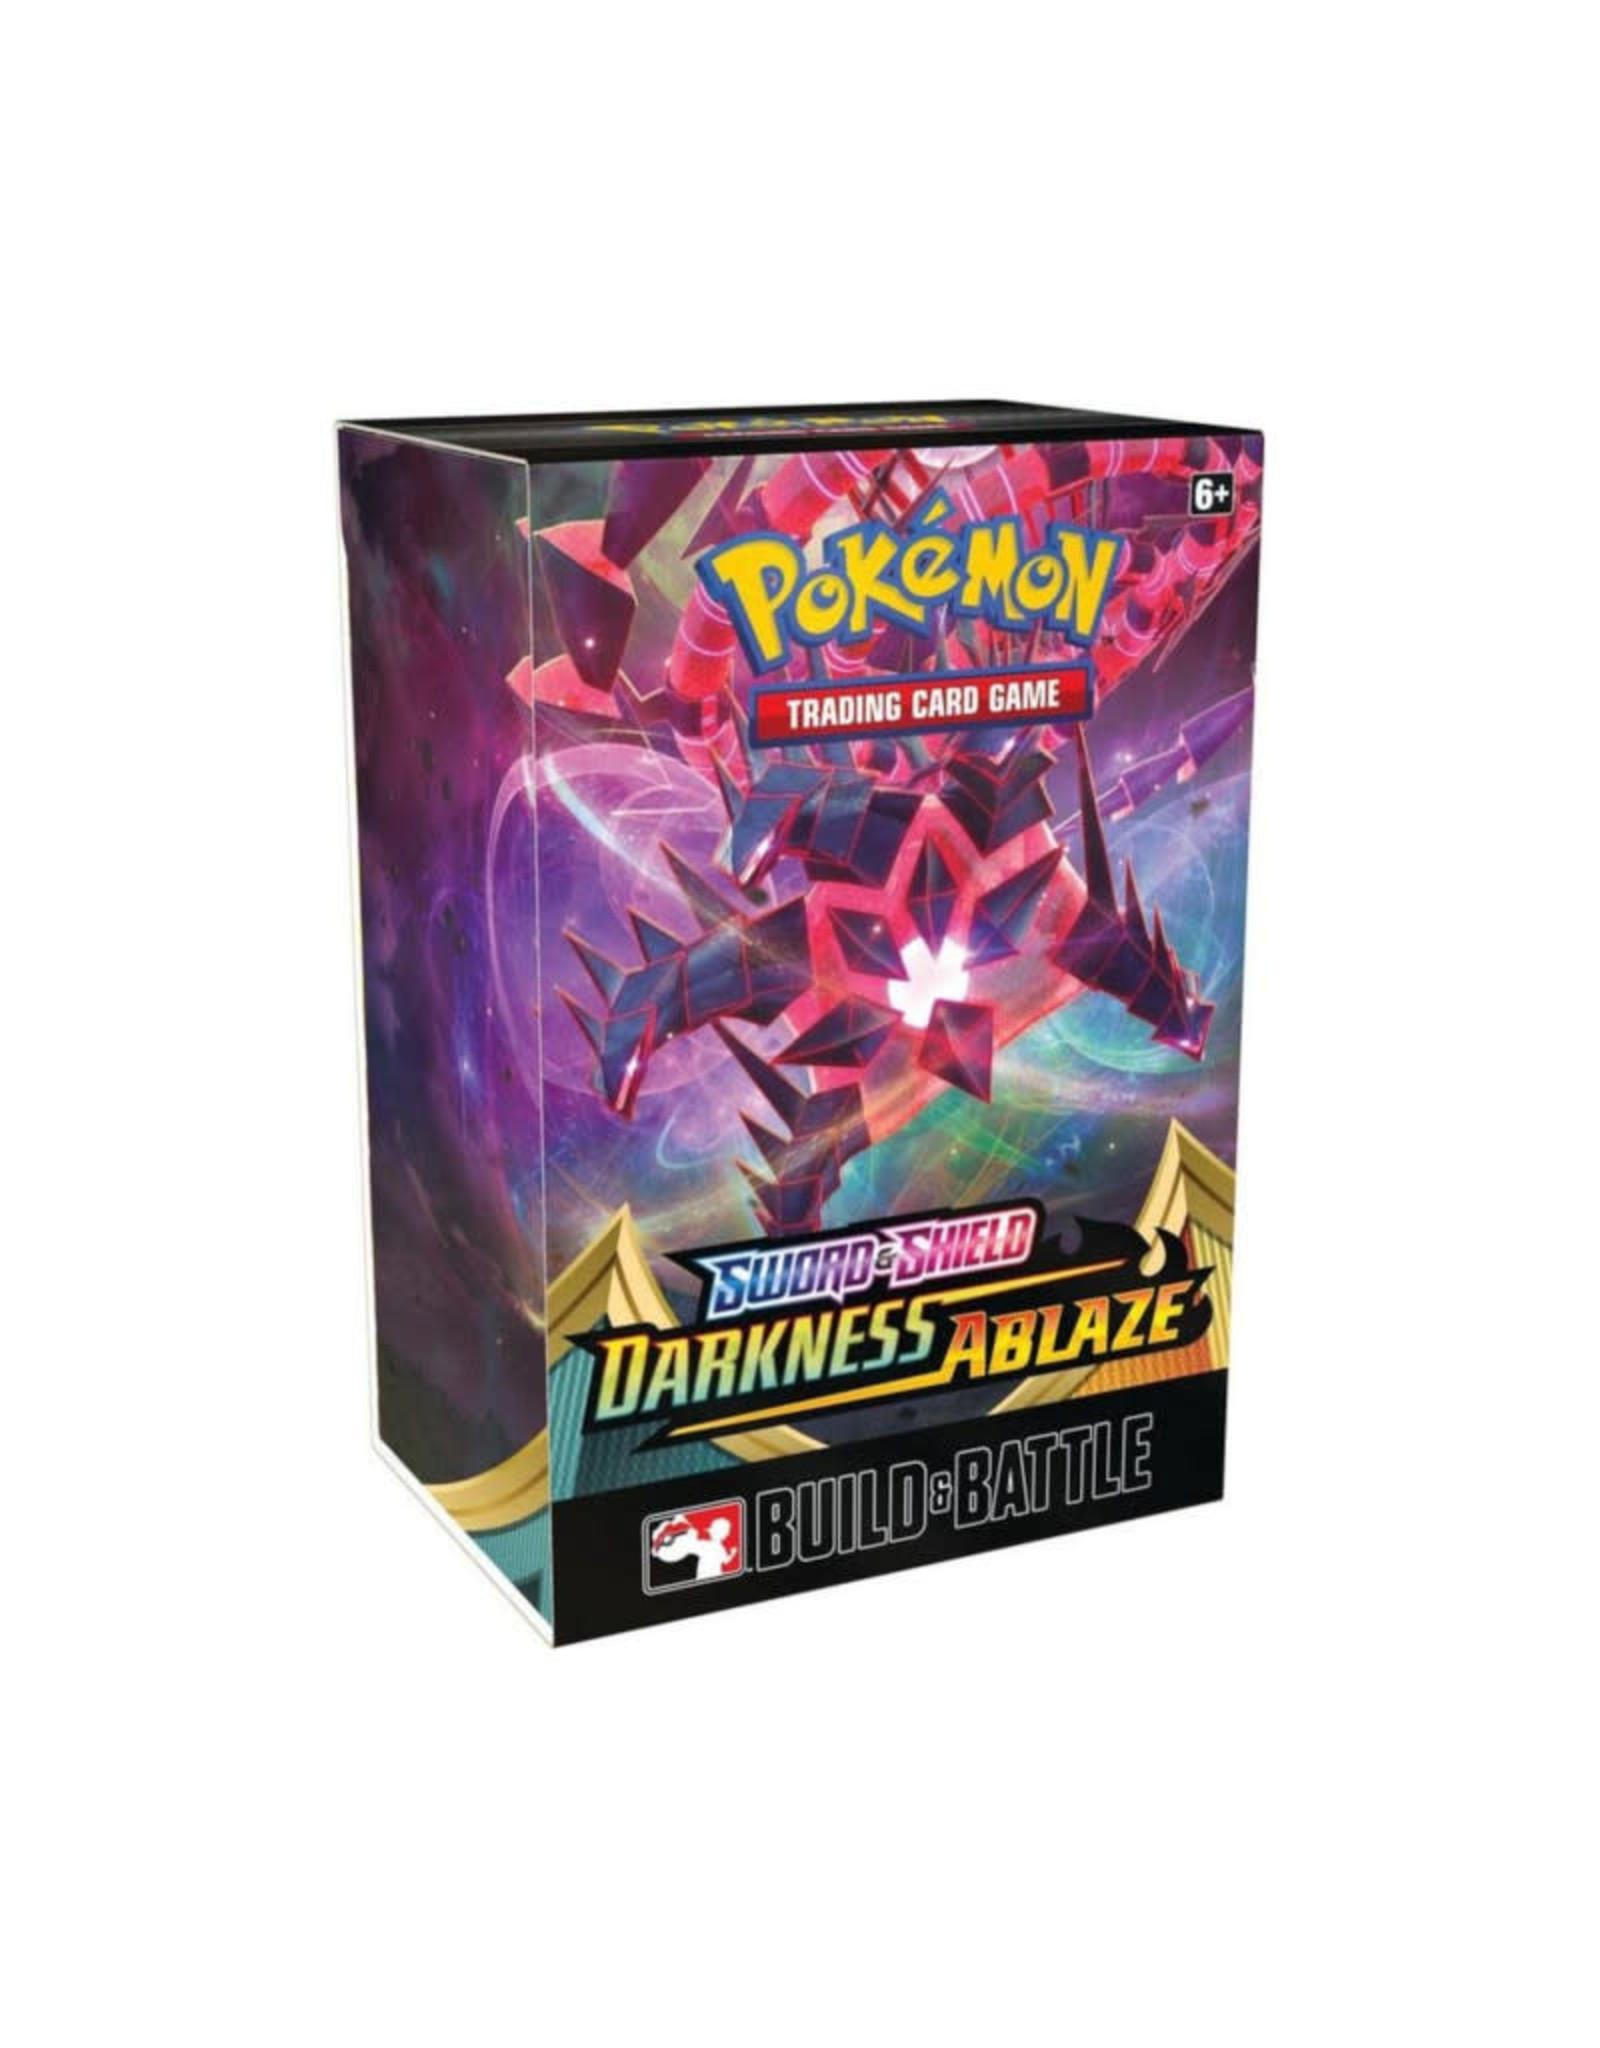 Pokemon Pokemon TCG Darkness Ablaze Build & Battle Box